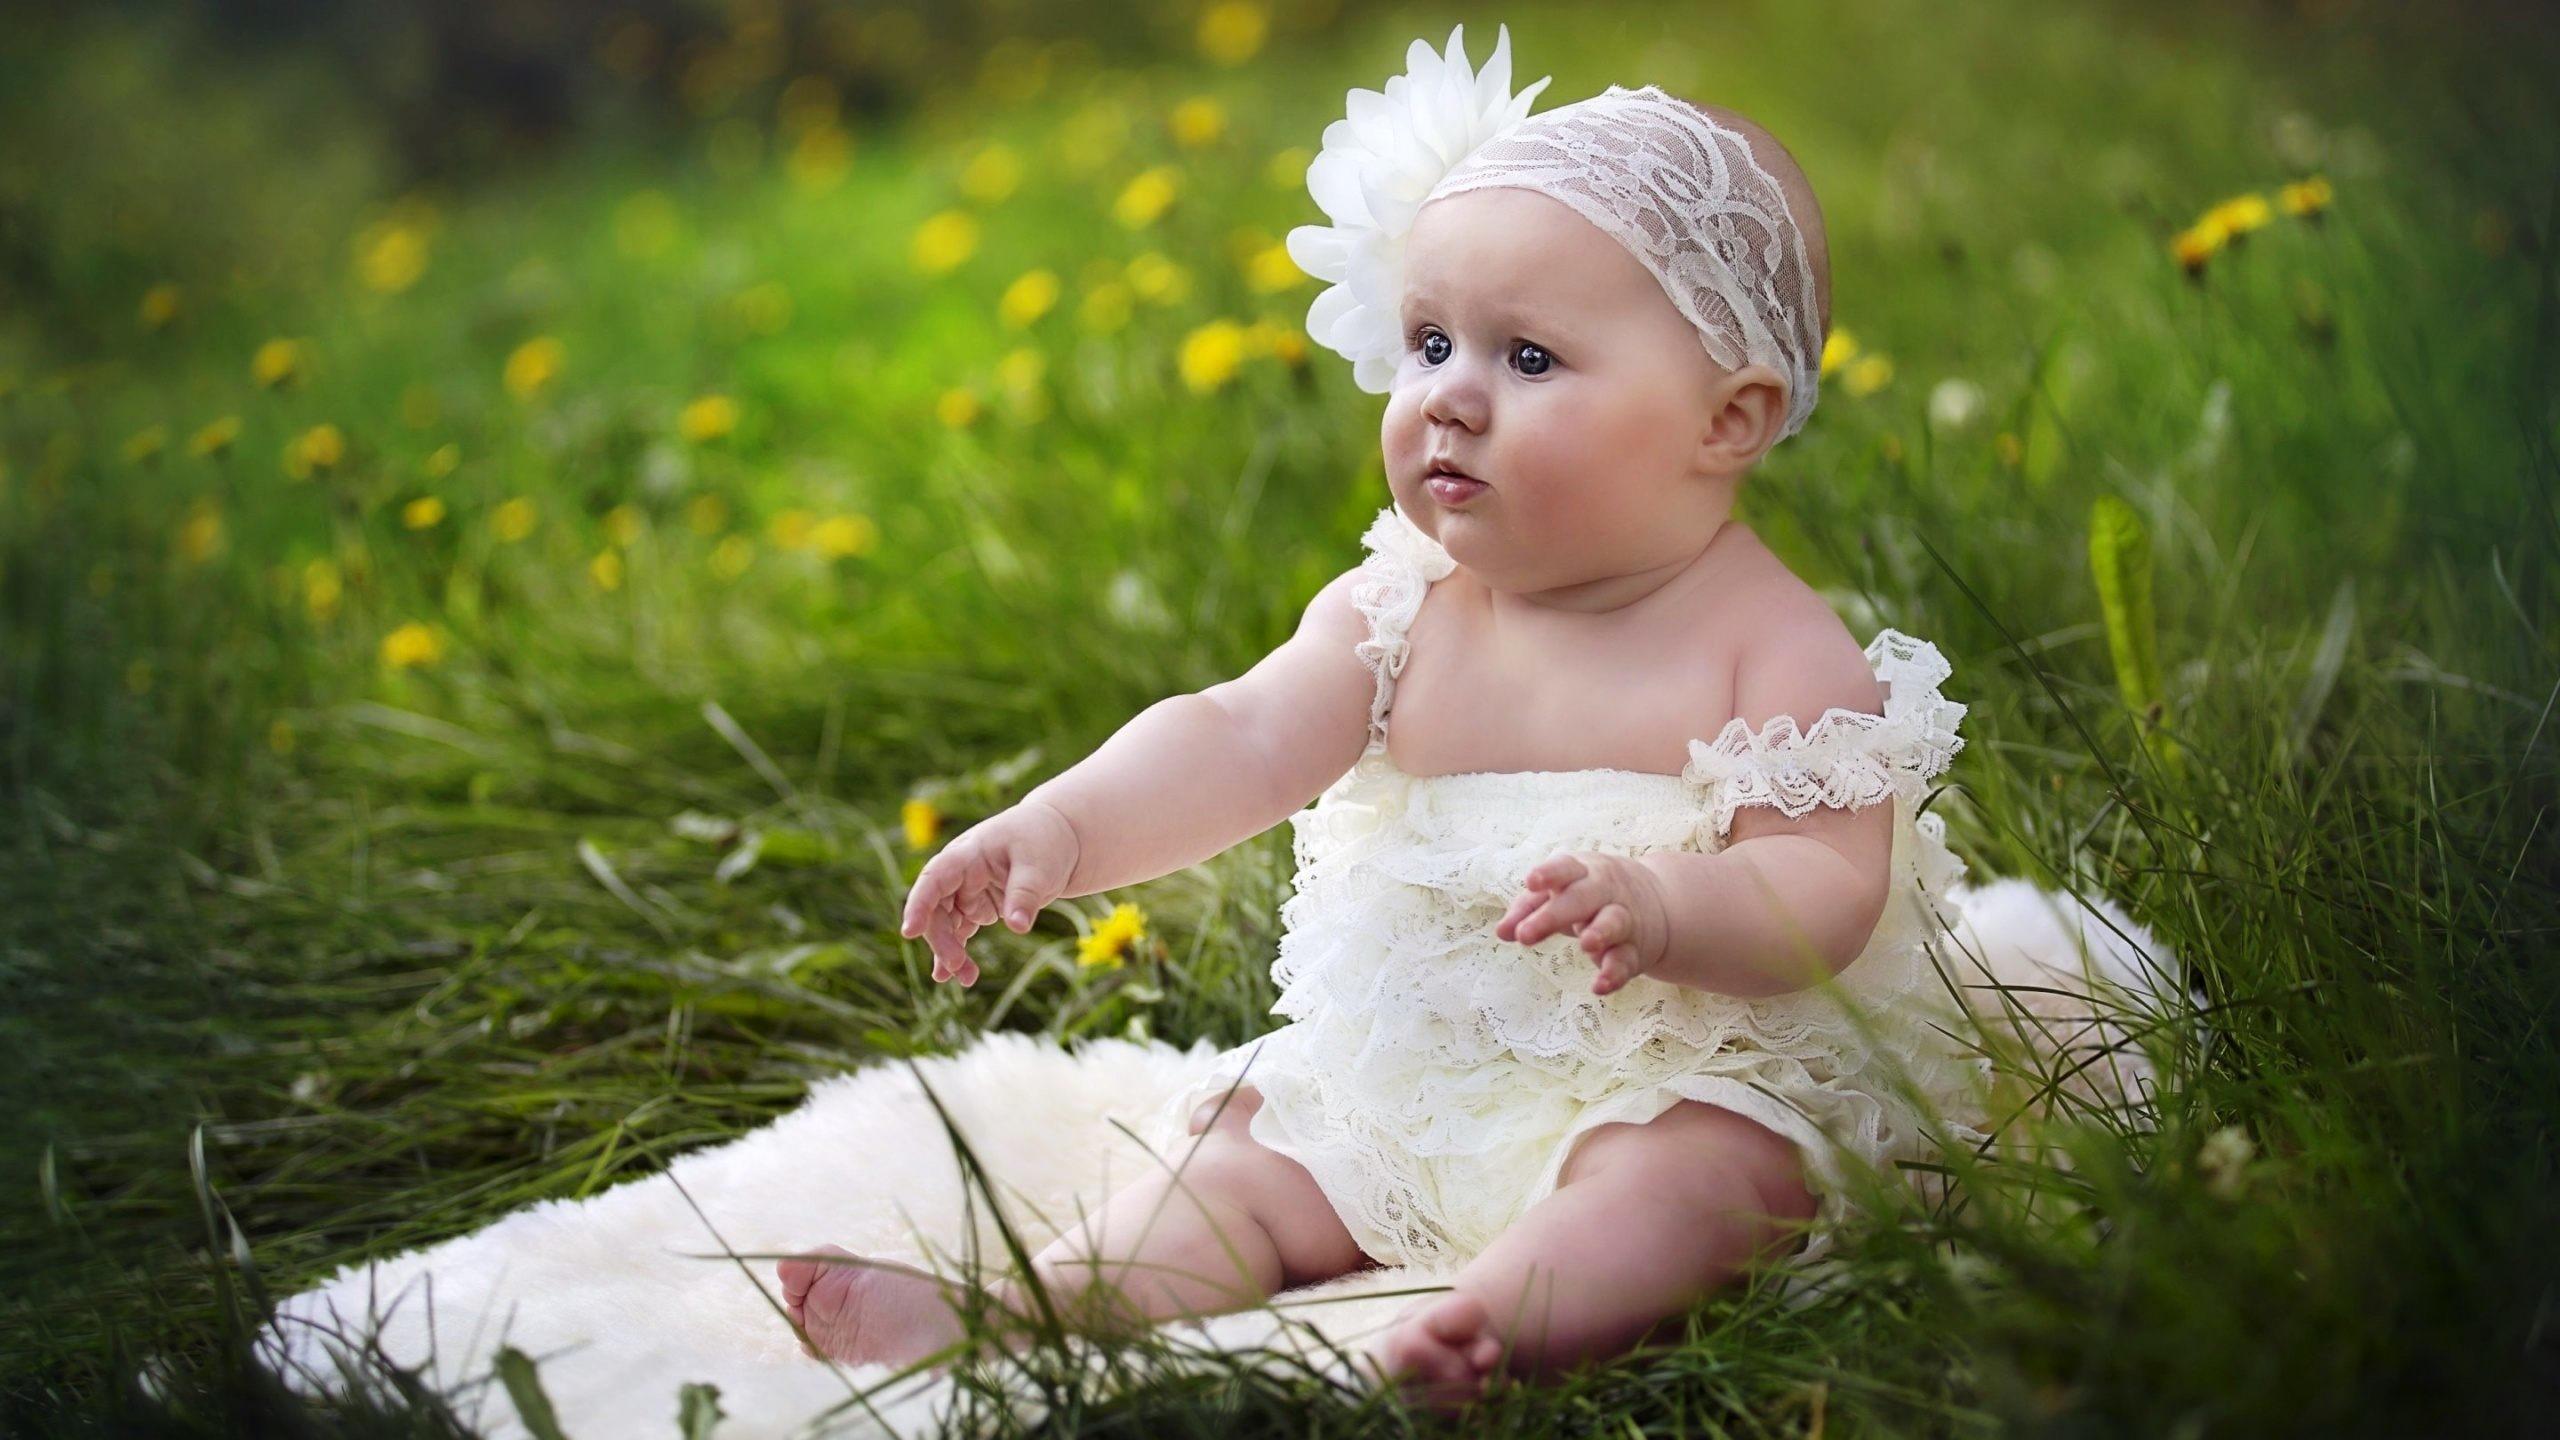 cute girl babies wallpapers